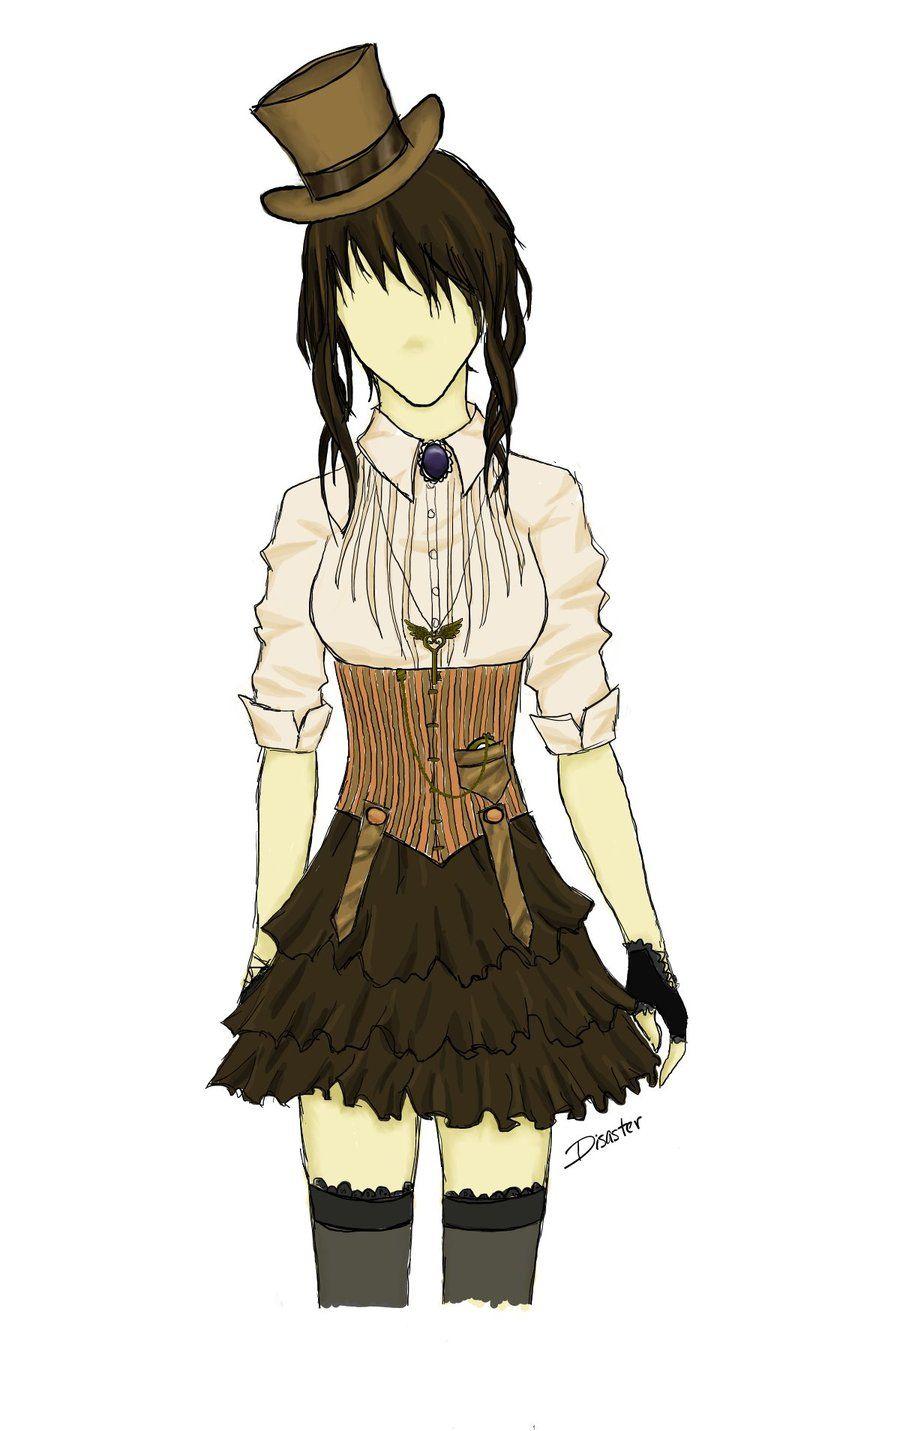 Steampunk Outfit Steampunk Clothing Victorian Steampunk Steampunk Dress